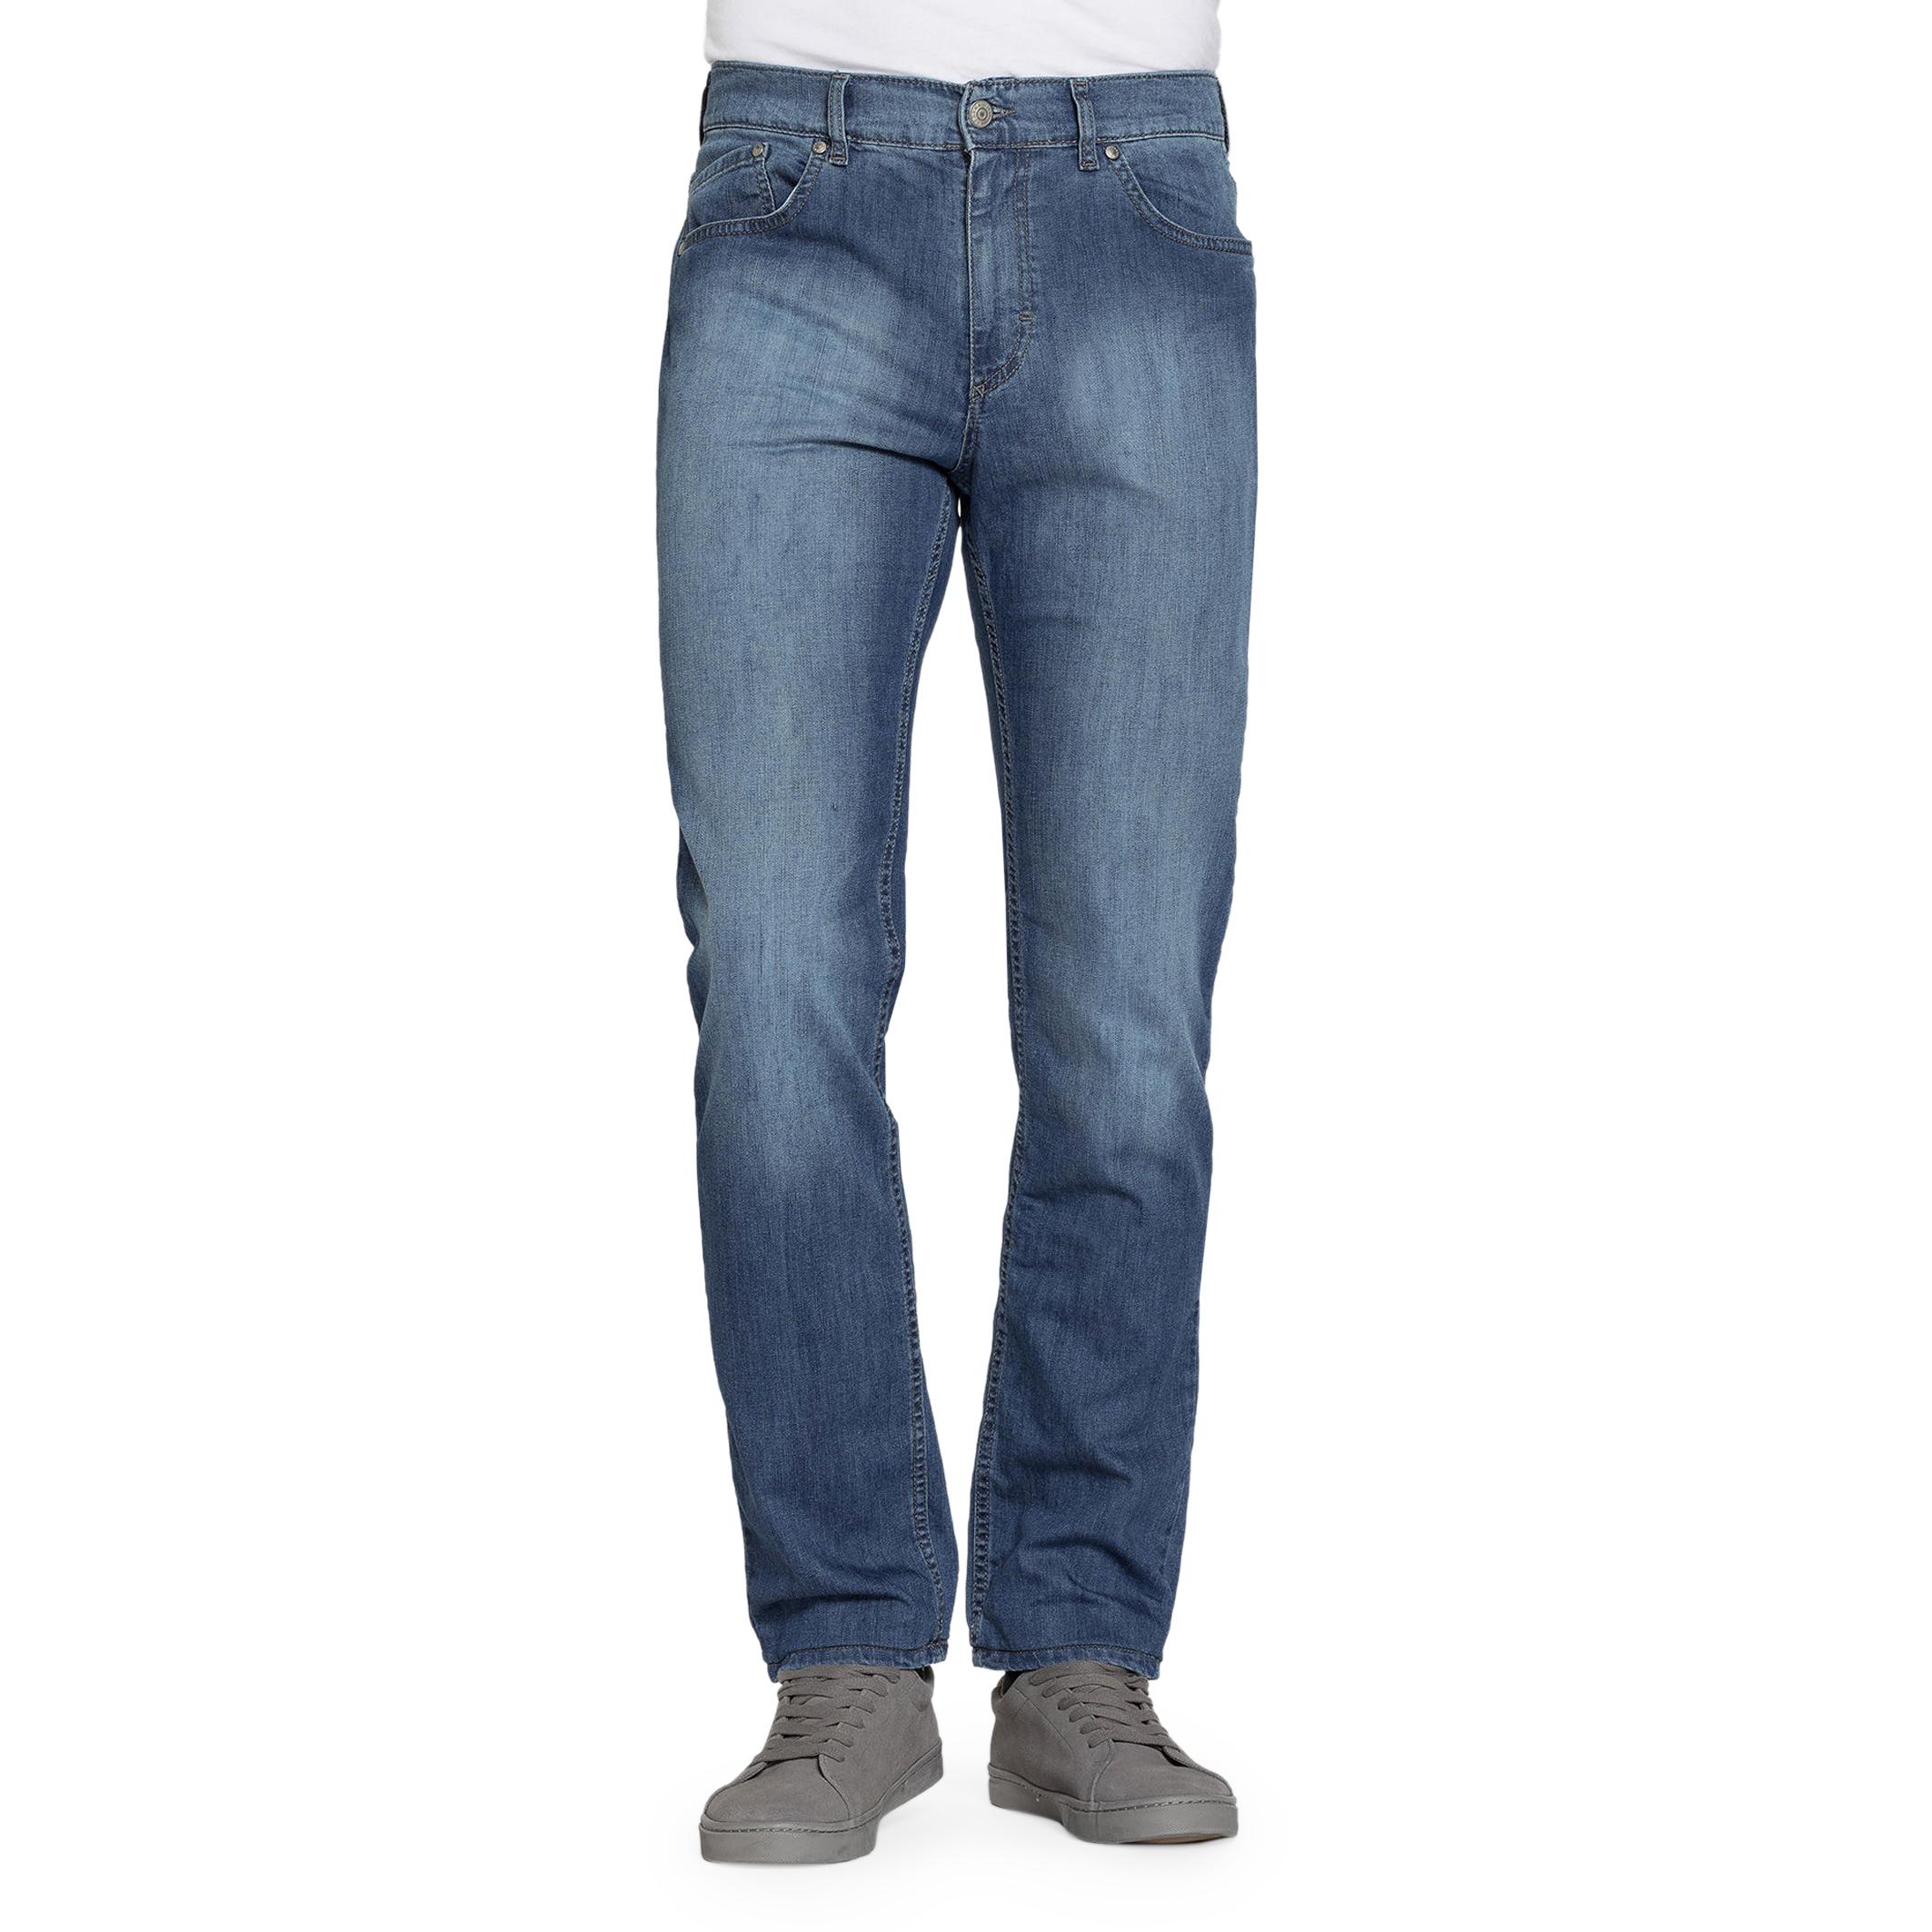 Carrera Jeans 700-941A